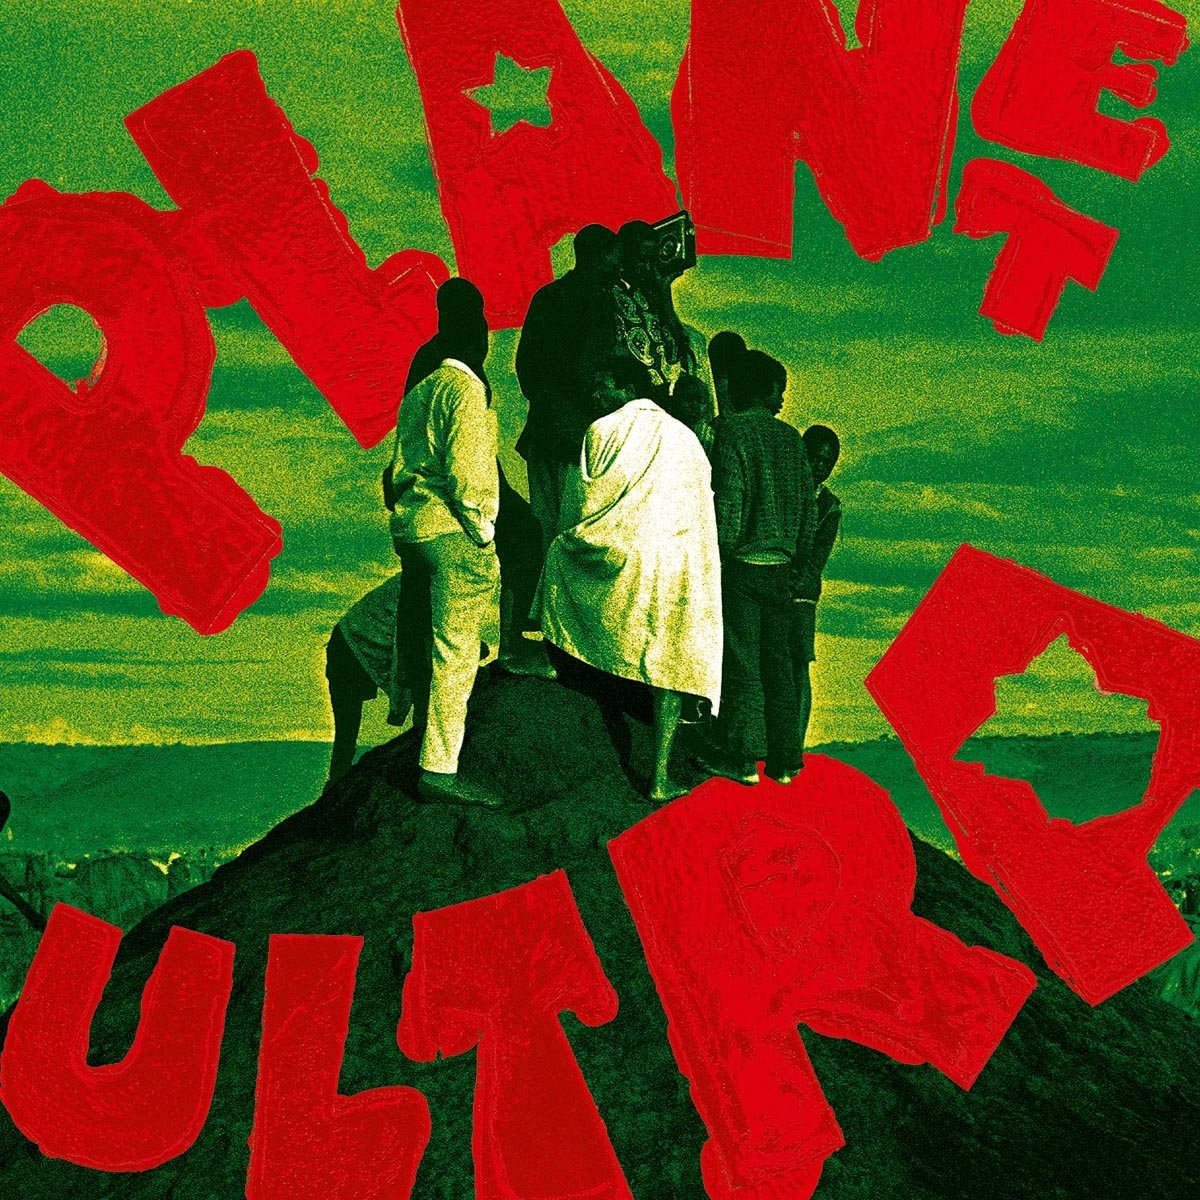 Urban Dance Squad - Planet Ultra (180 Gram Vinyl, Bonus Tracks, Gatefold LP Jacket, Limited Edition, Remastered)